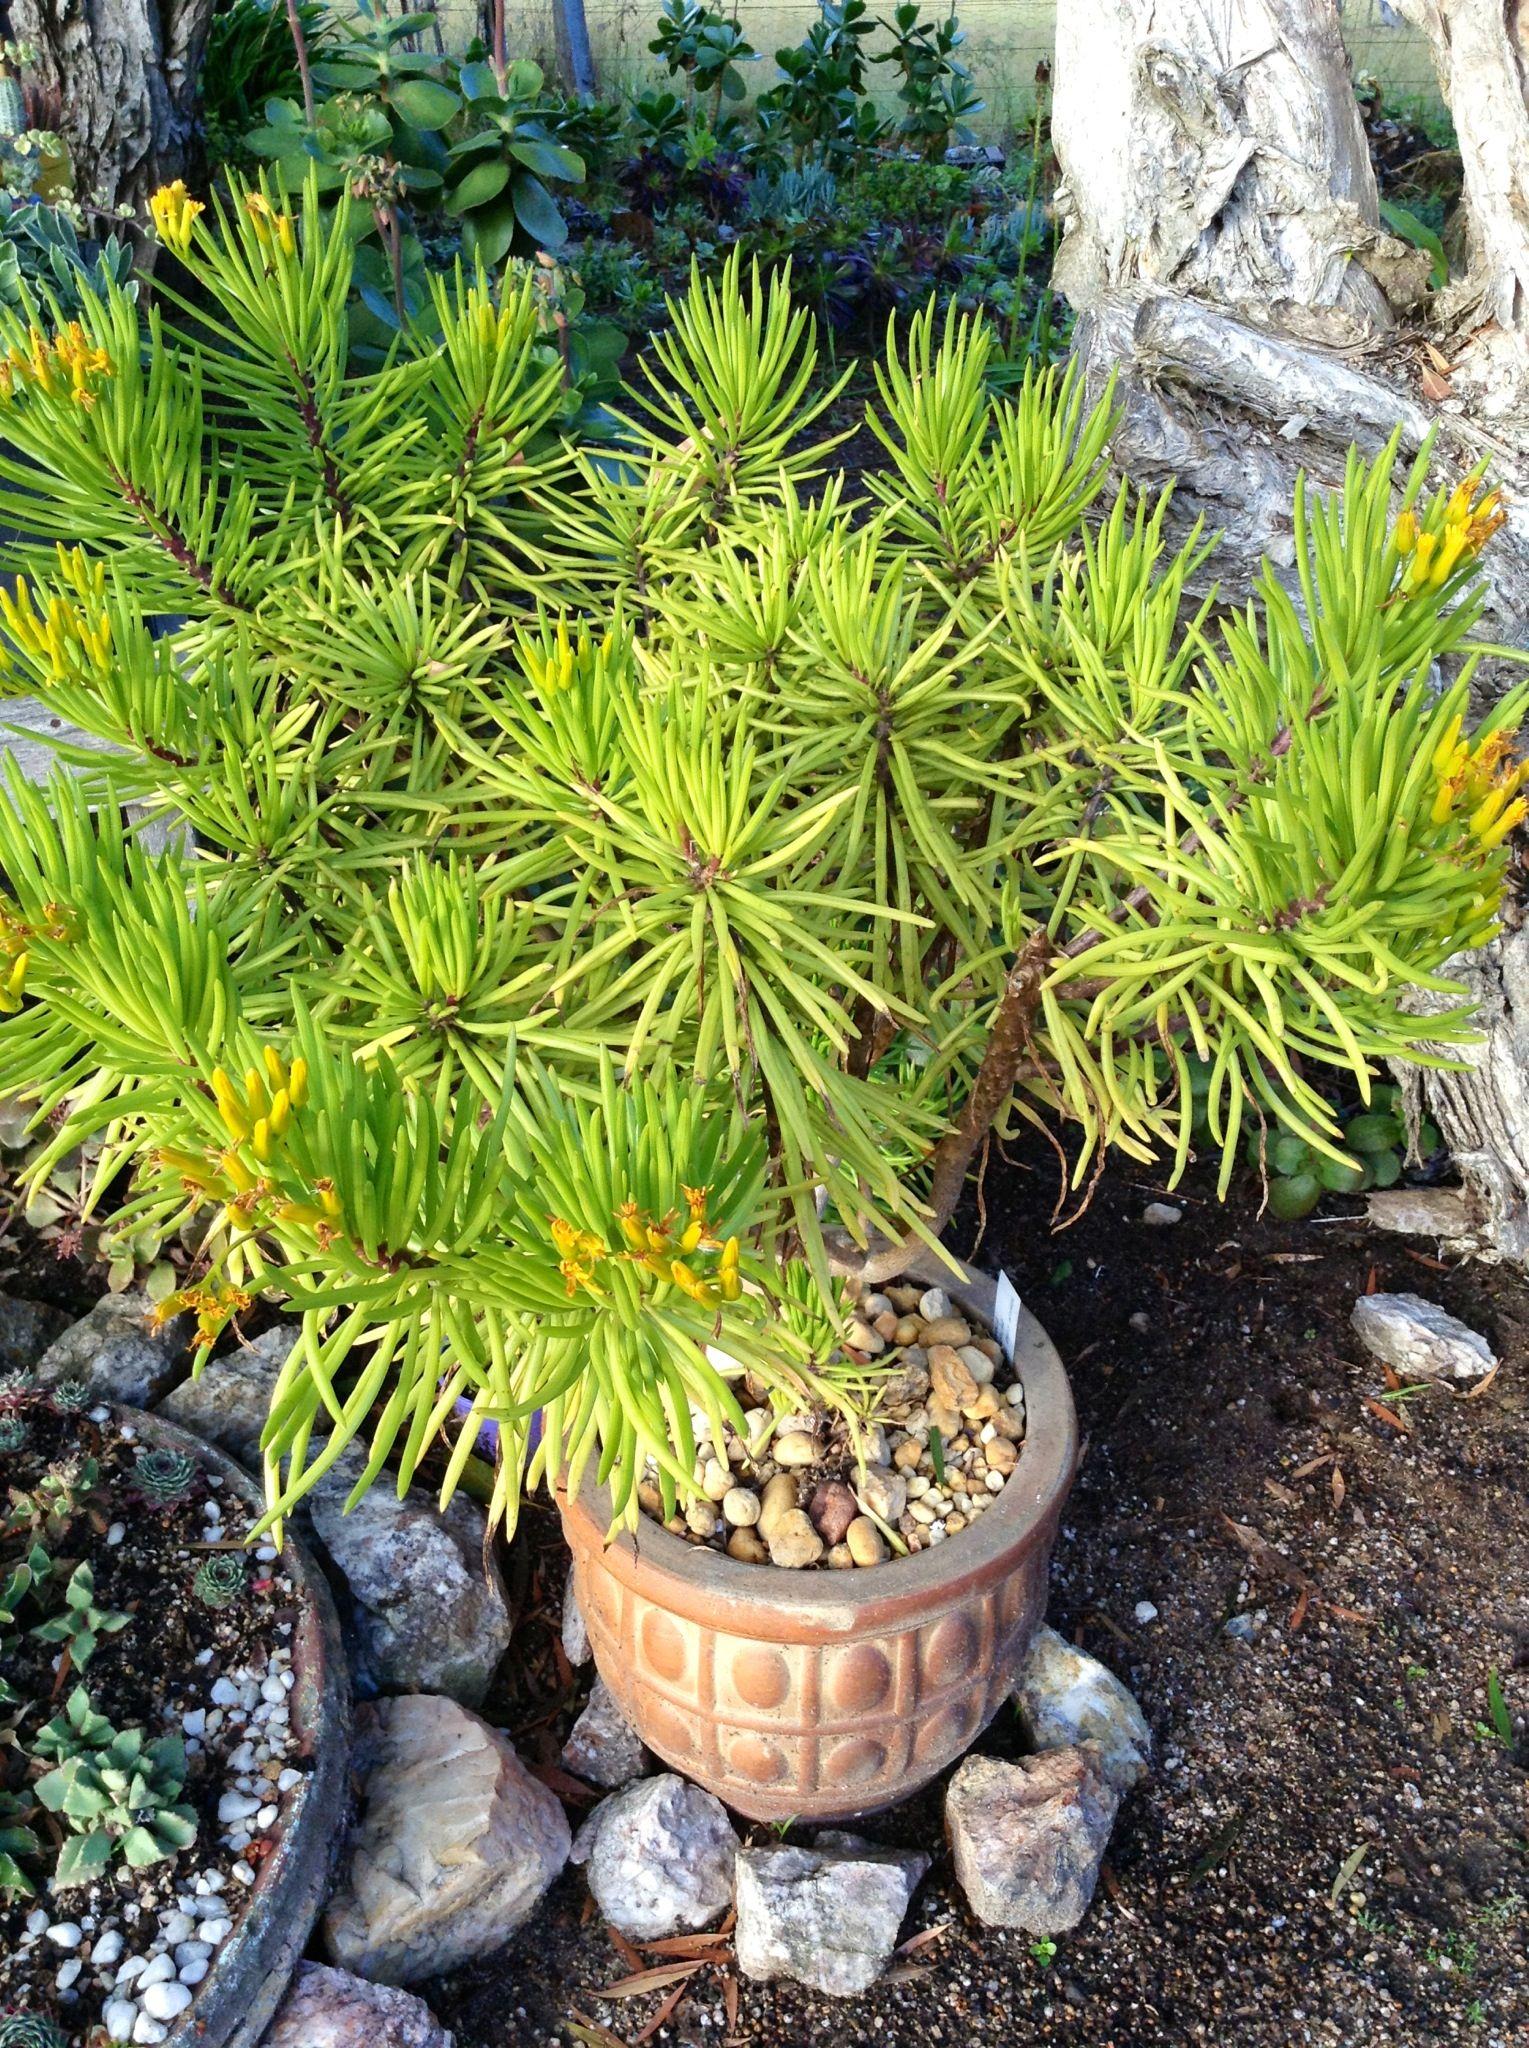 Senicio hermosae syn. Canariothamnus hermosae. Occurs in the Canary Islands | Collectors Corner, Gardenworld, Braeside